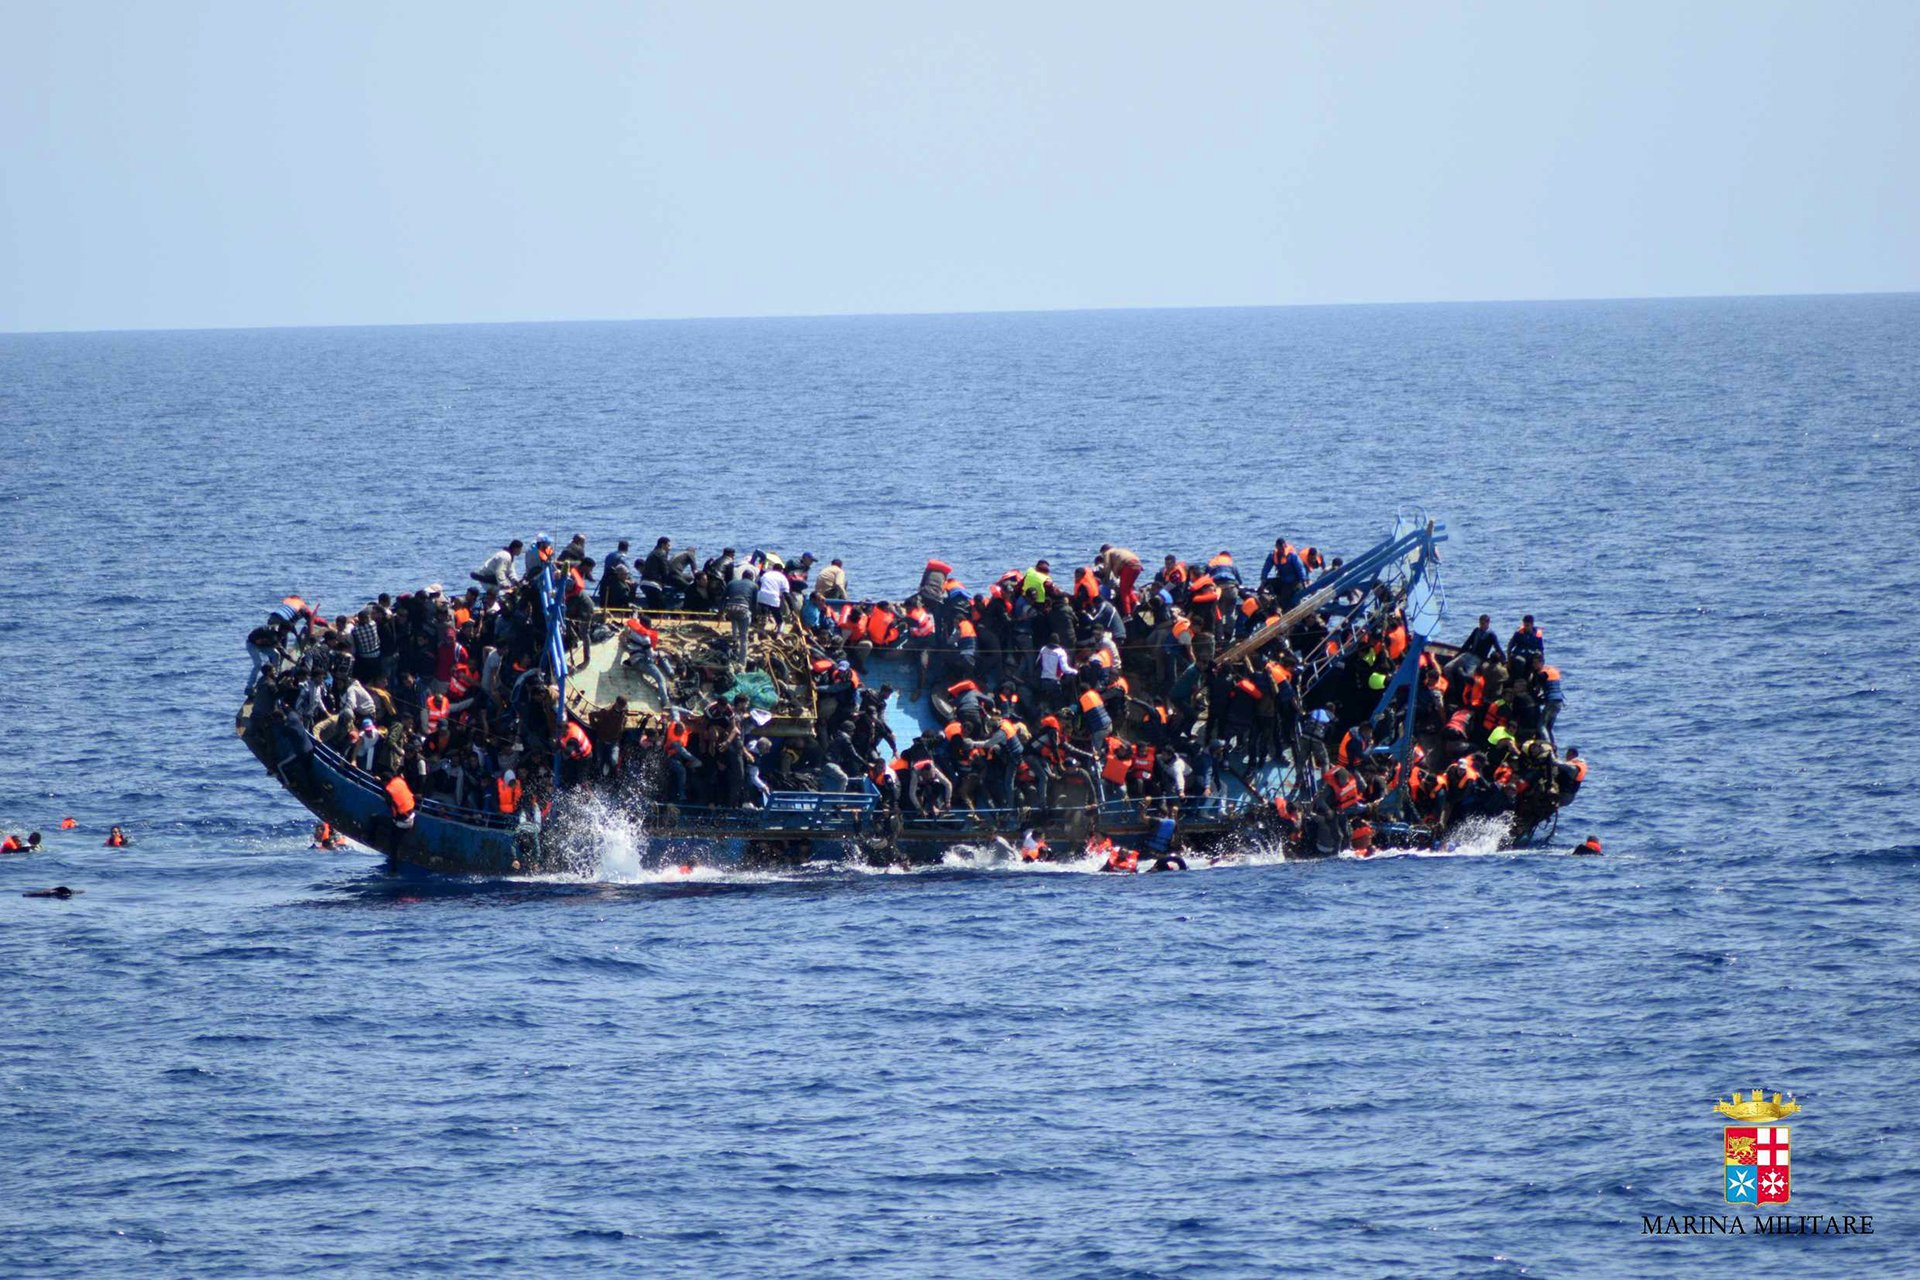 enbarcacion de refugiados